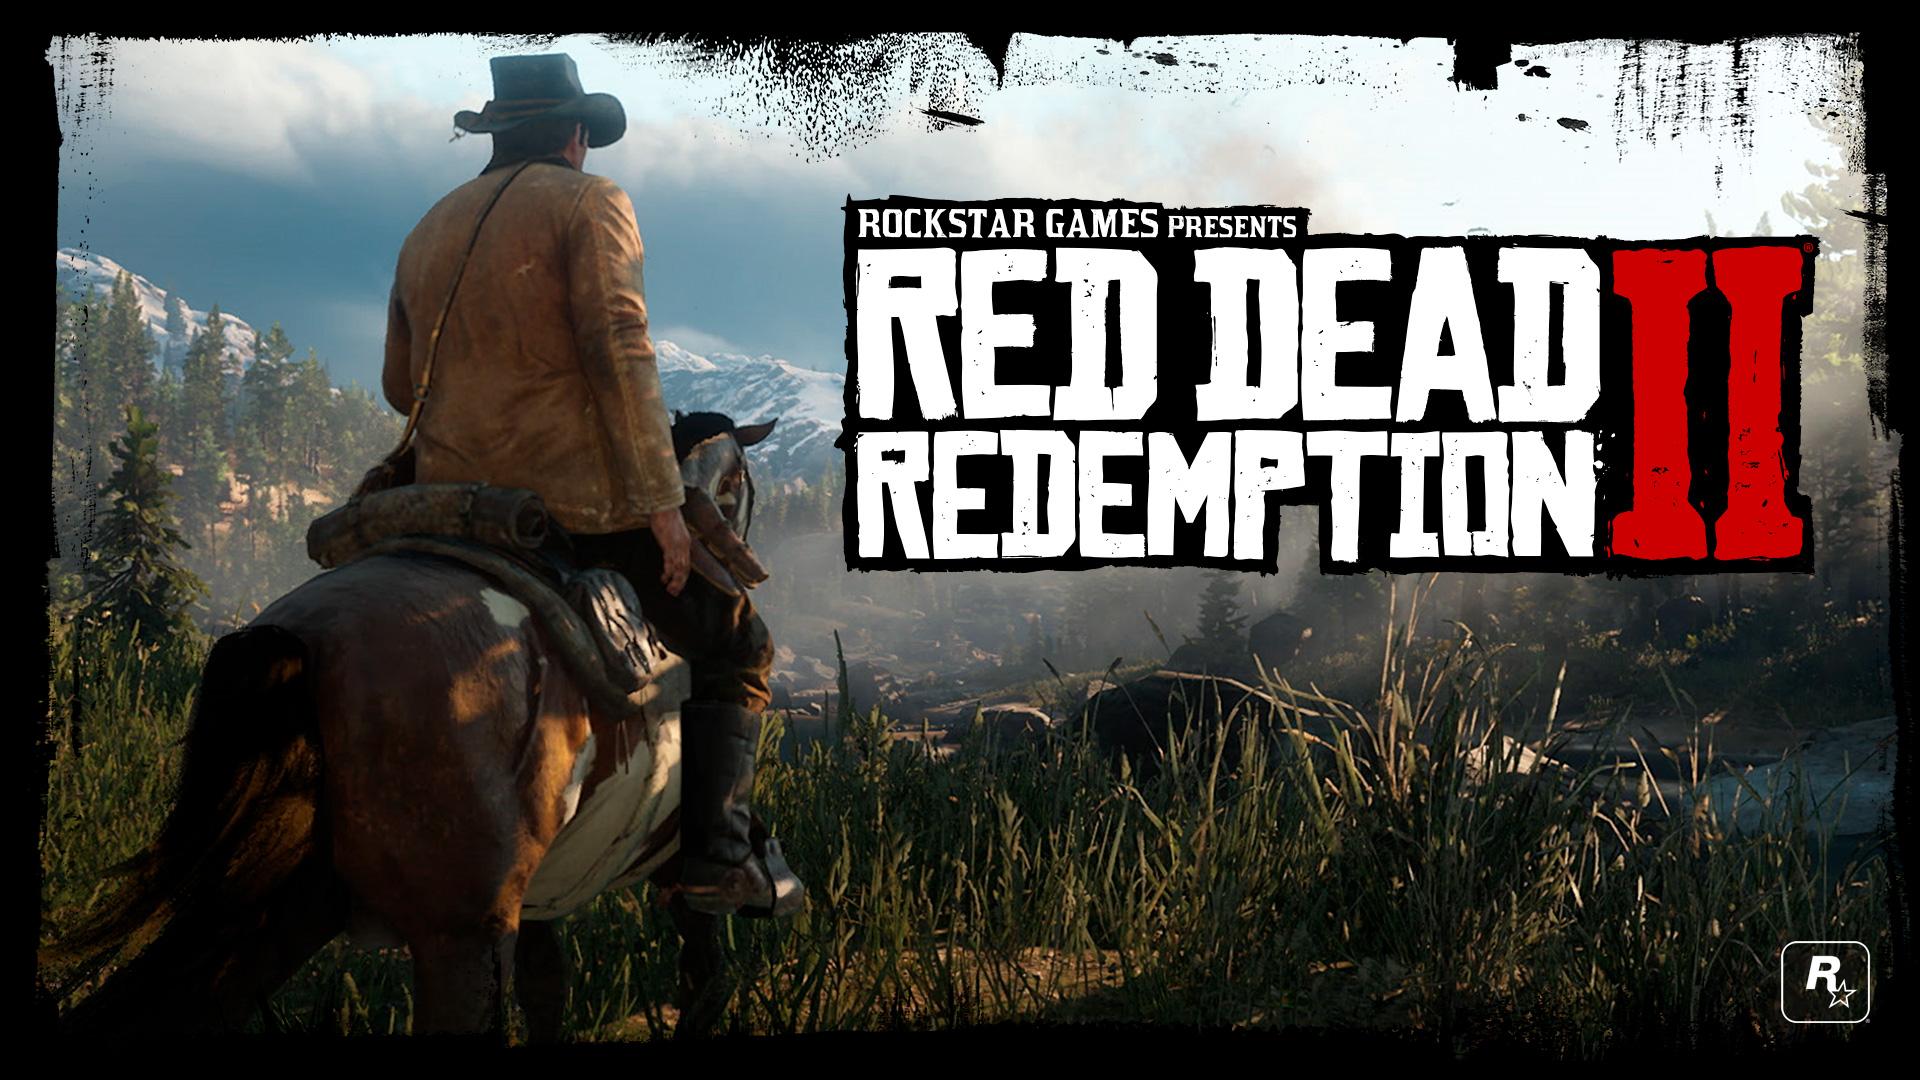 Red Dead Redemption 2's second trailer confirms it's a prequel